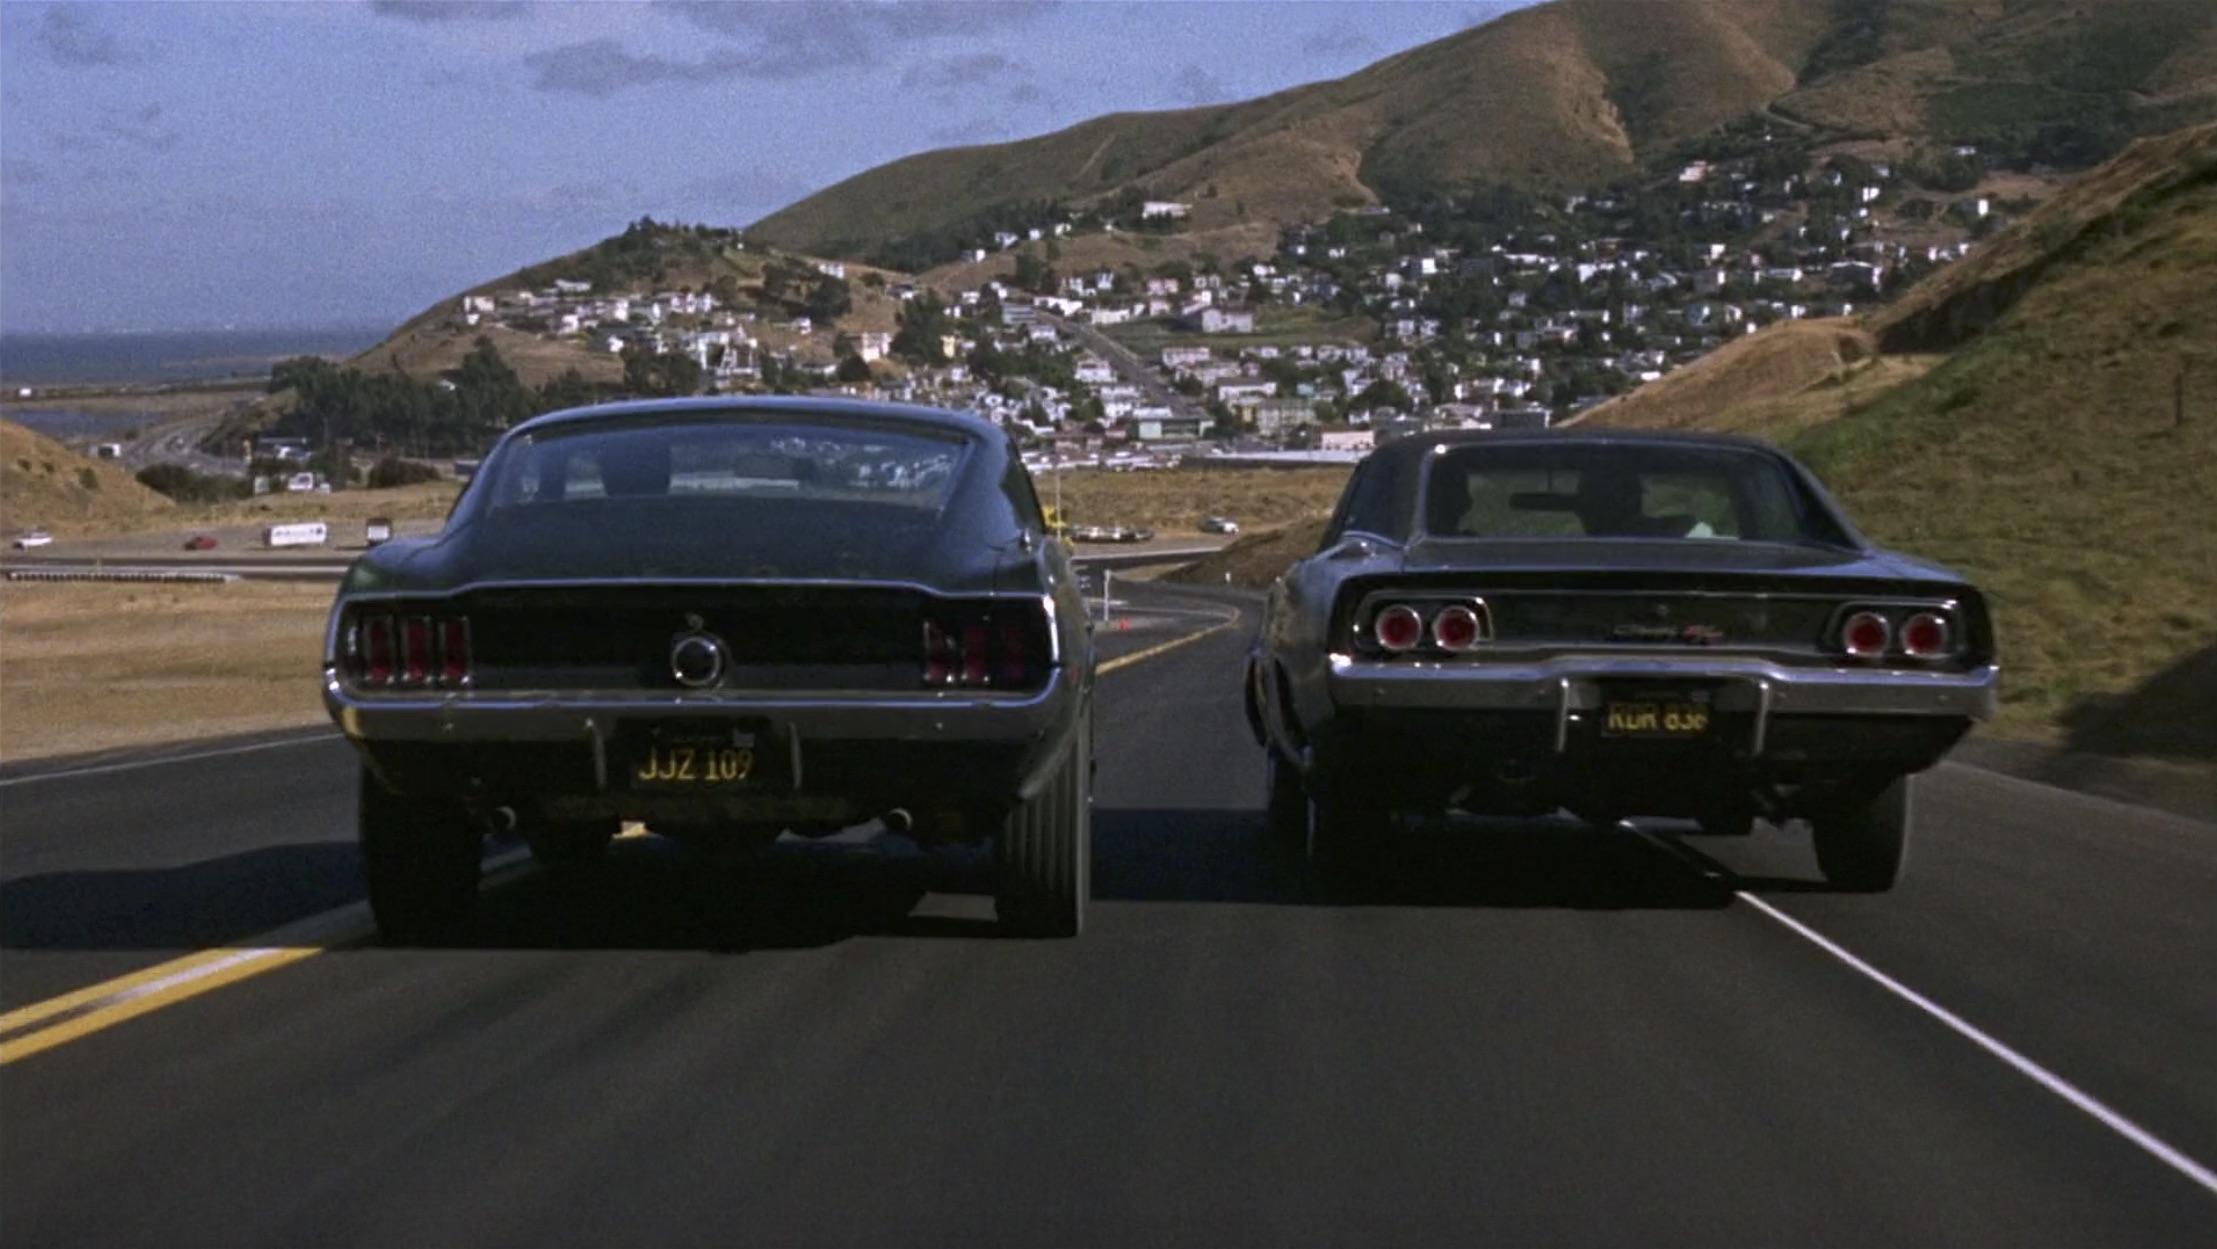 Bullitt Mustang racing away from a Dodge Charger